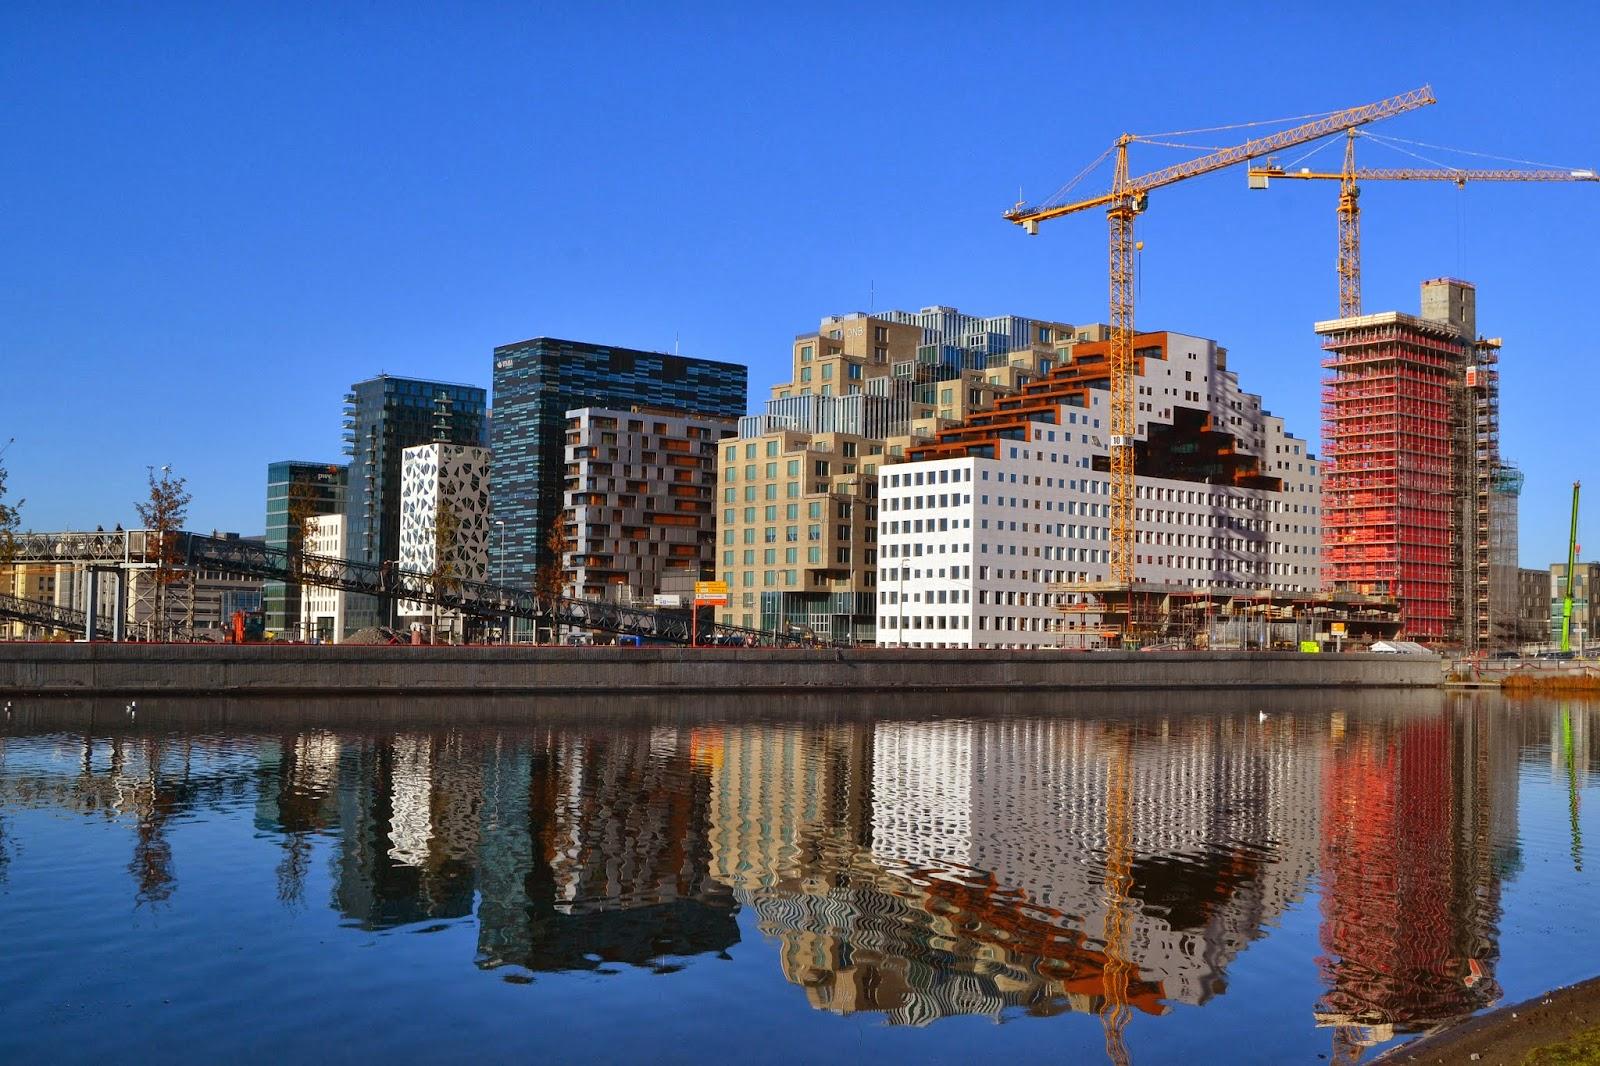 Oslo Bjørvika skyline